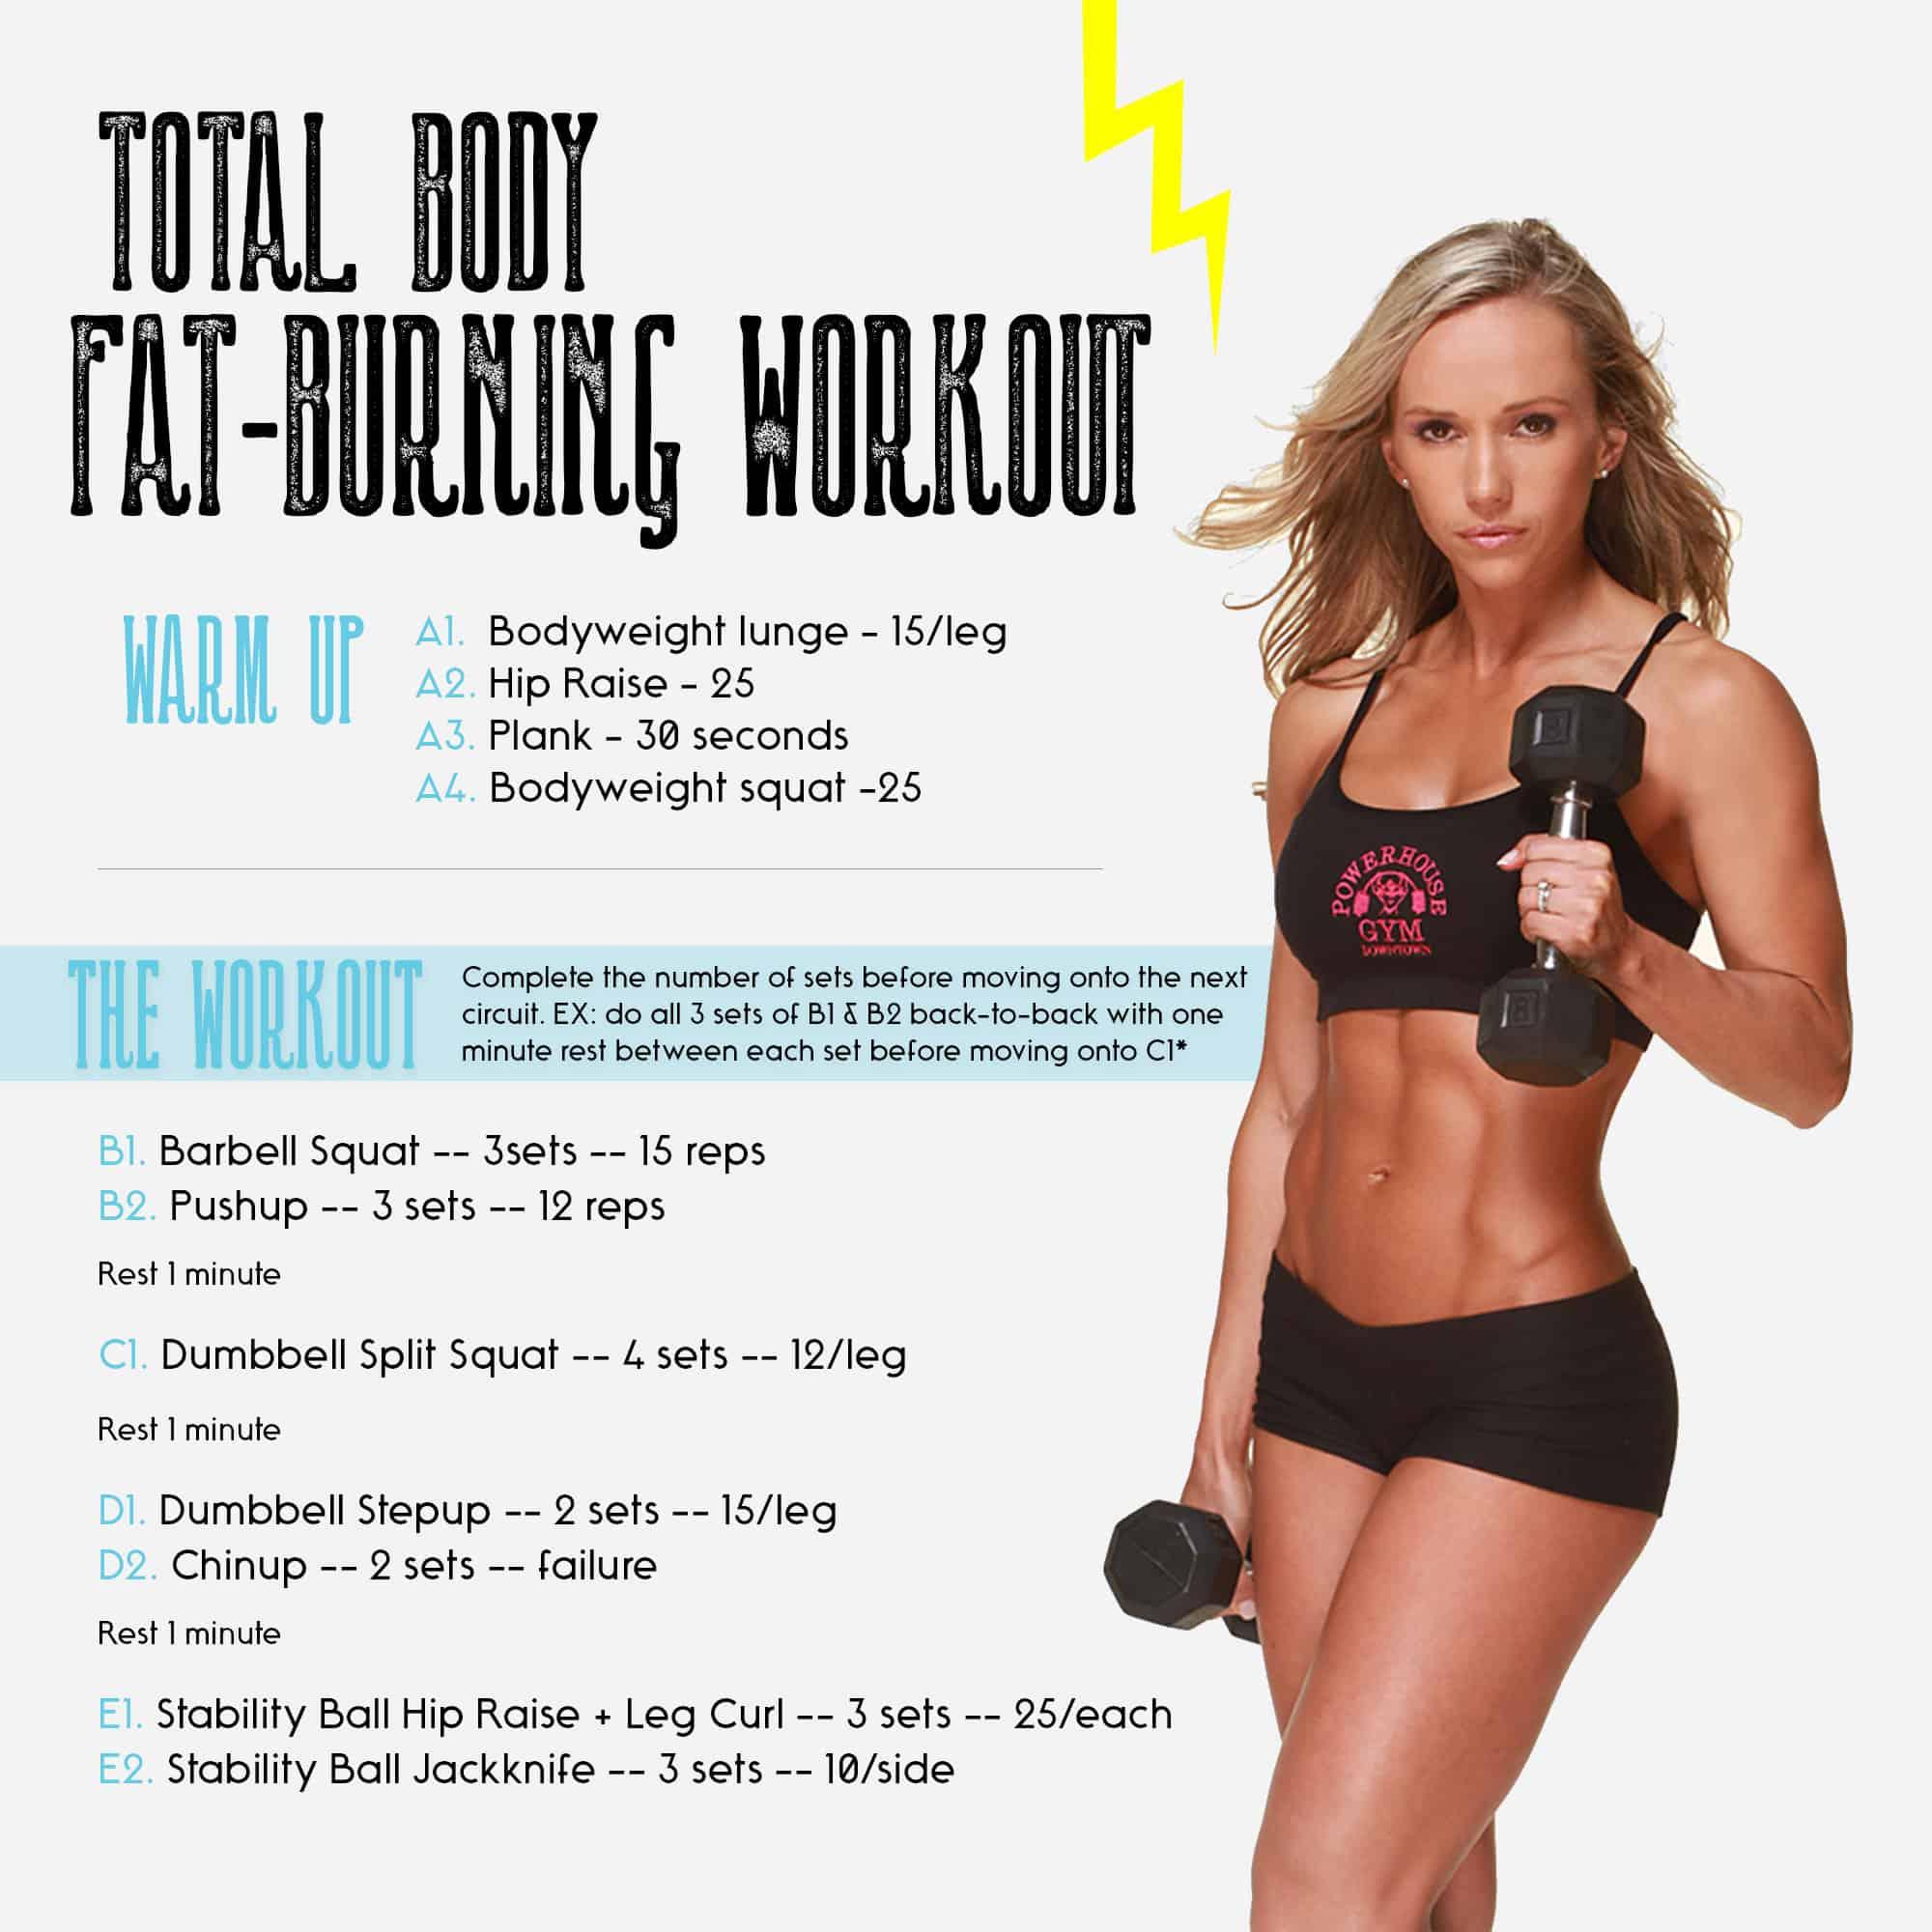 Total Body Fat-Burning Workout